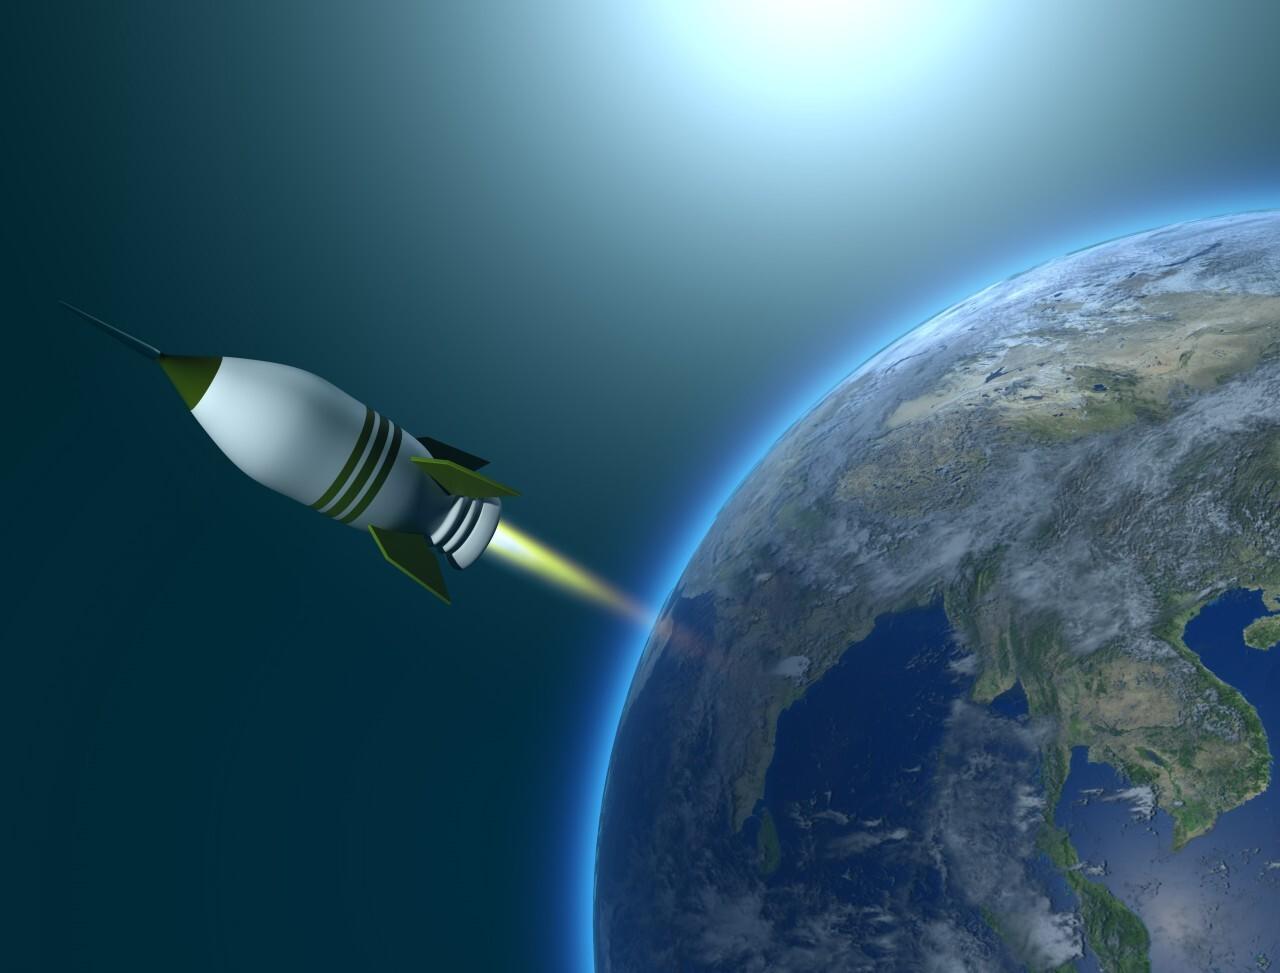 Rocket leaves earth